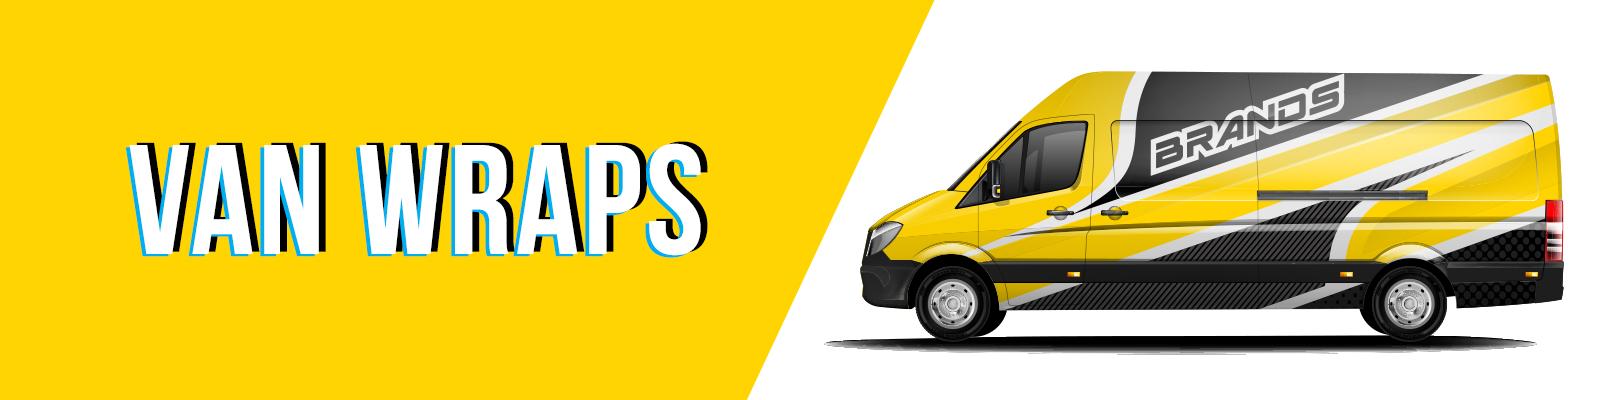 Vans Vehicle Wrap